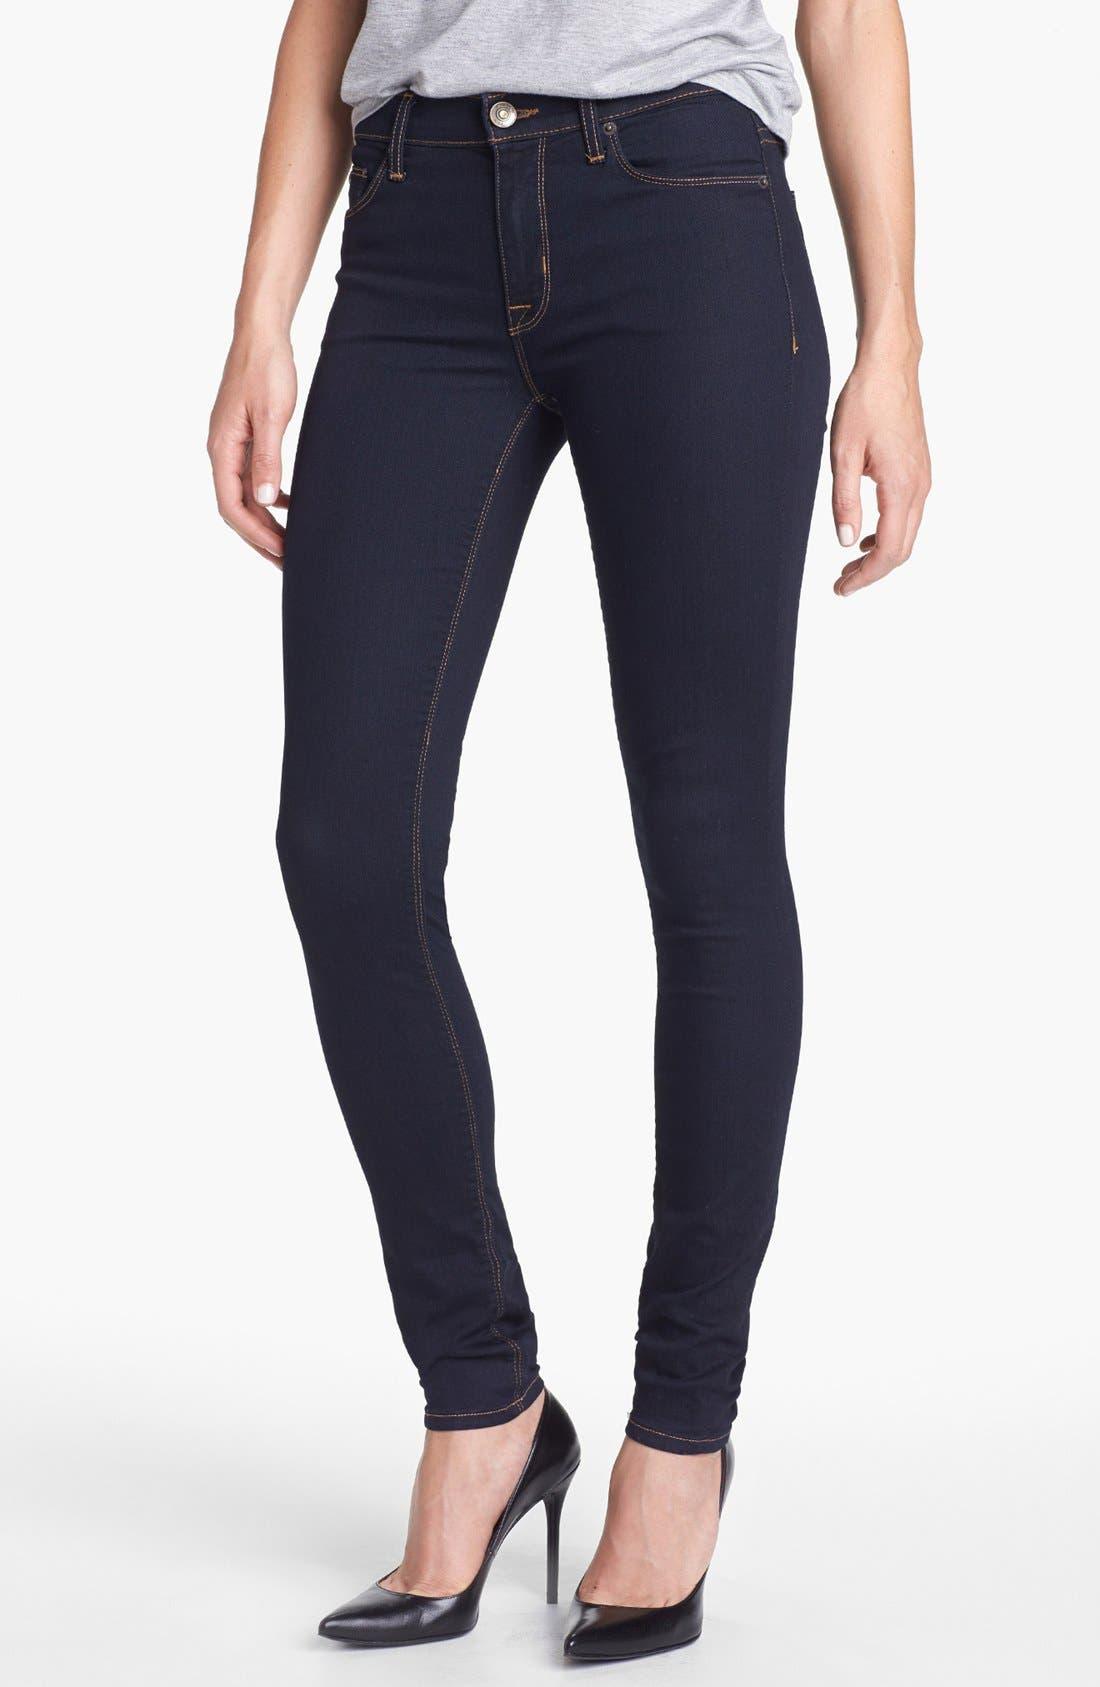 Alternate Image 1 Selected - Hudson Jeans 'Nico' Super Skinny Jeans (Storm)